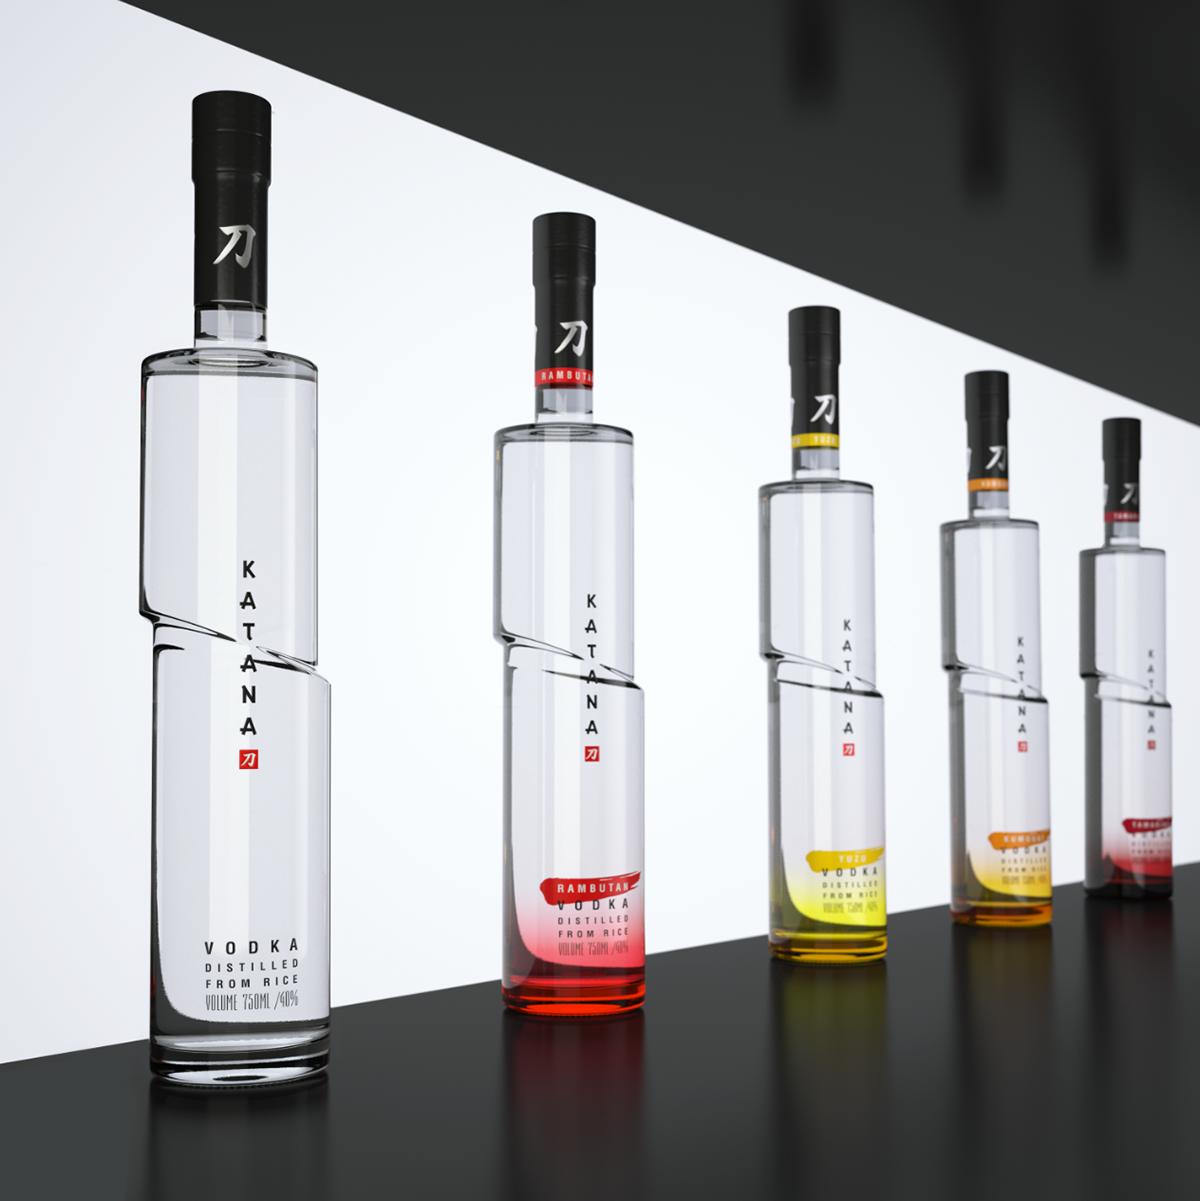 Vodka,alcohol,samurai,glass,bottle,Packaging,vodka design,samurai vodka,studioin